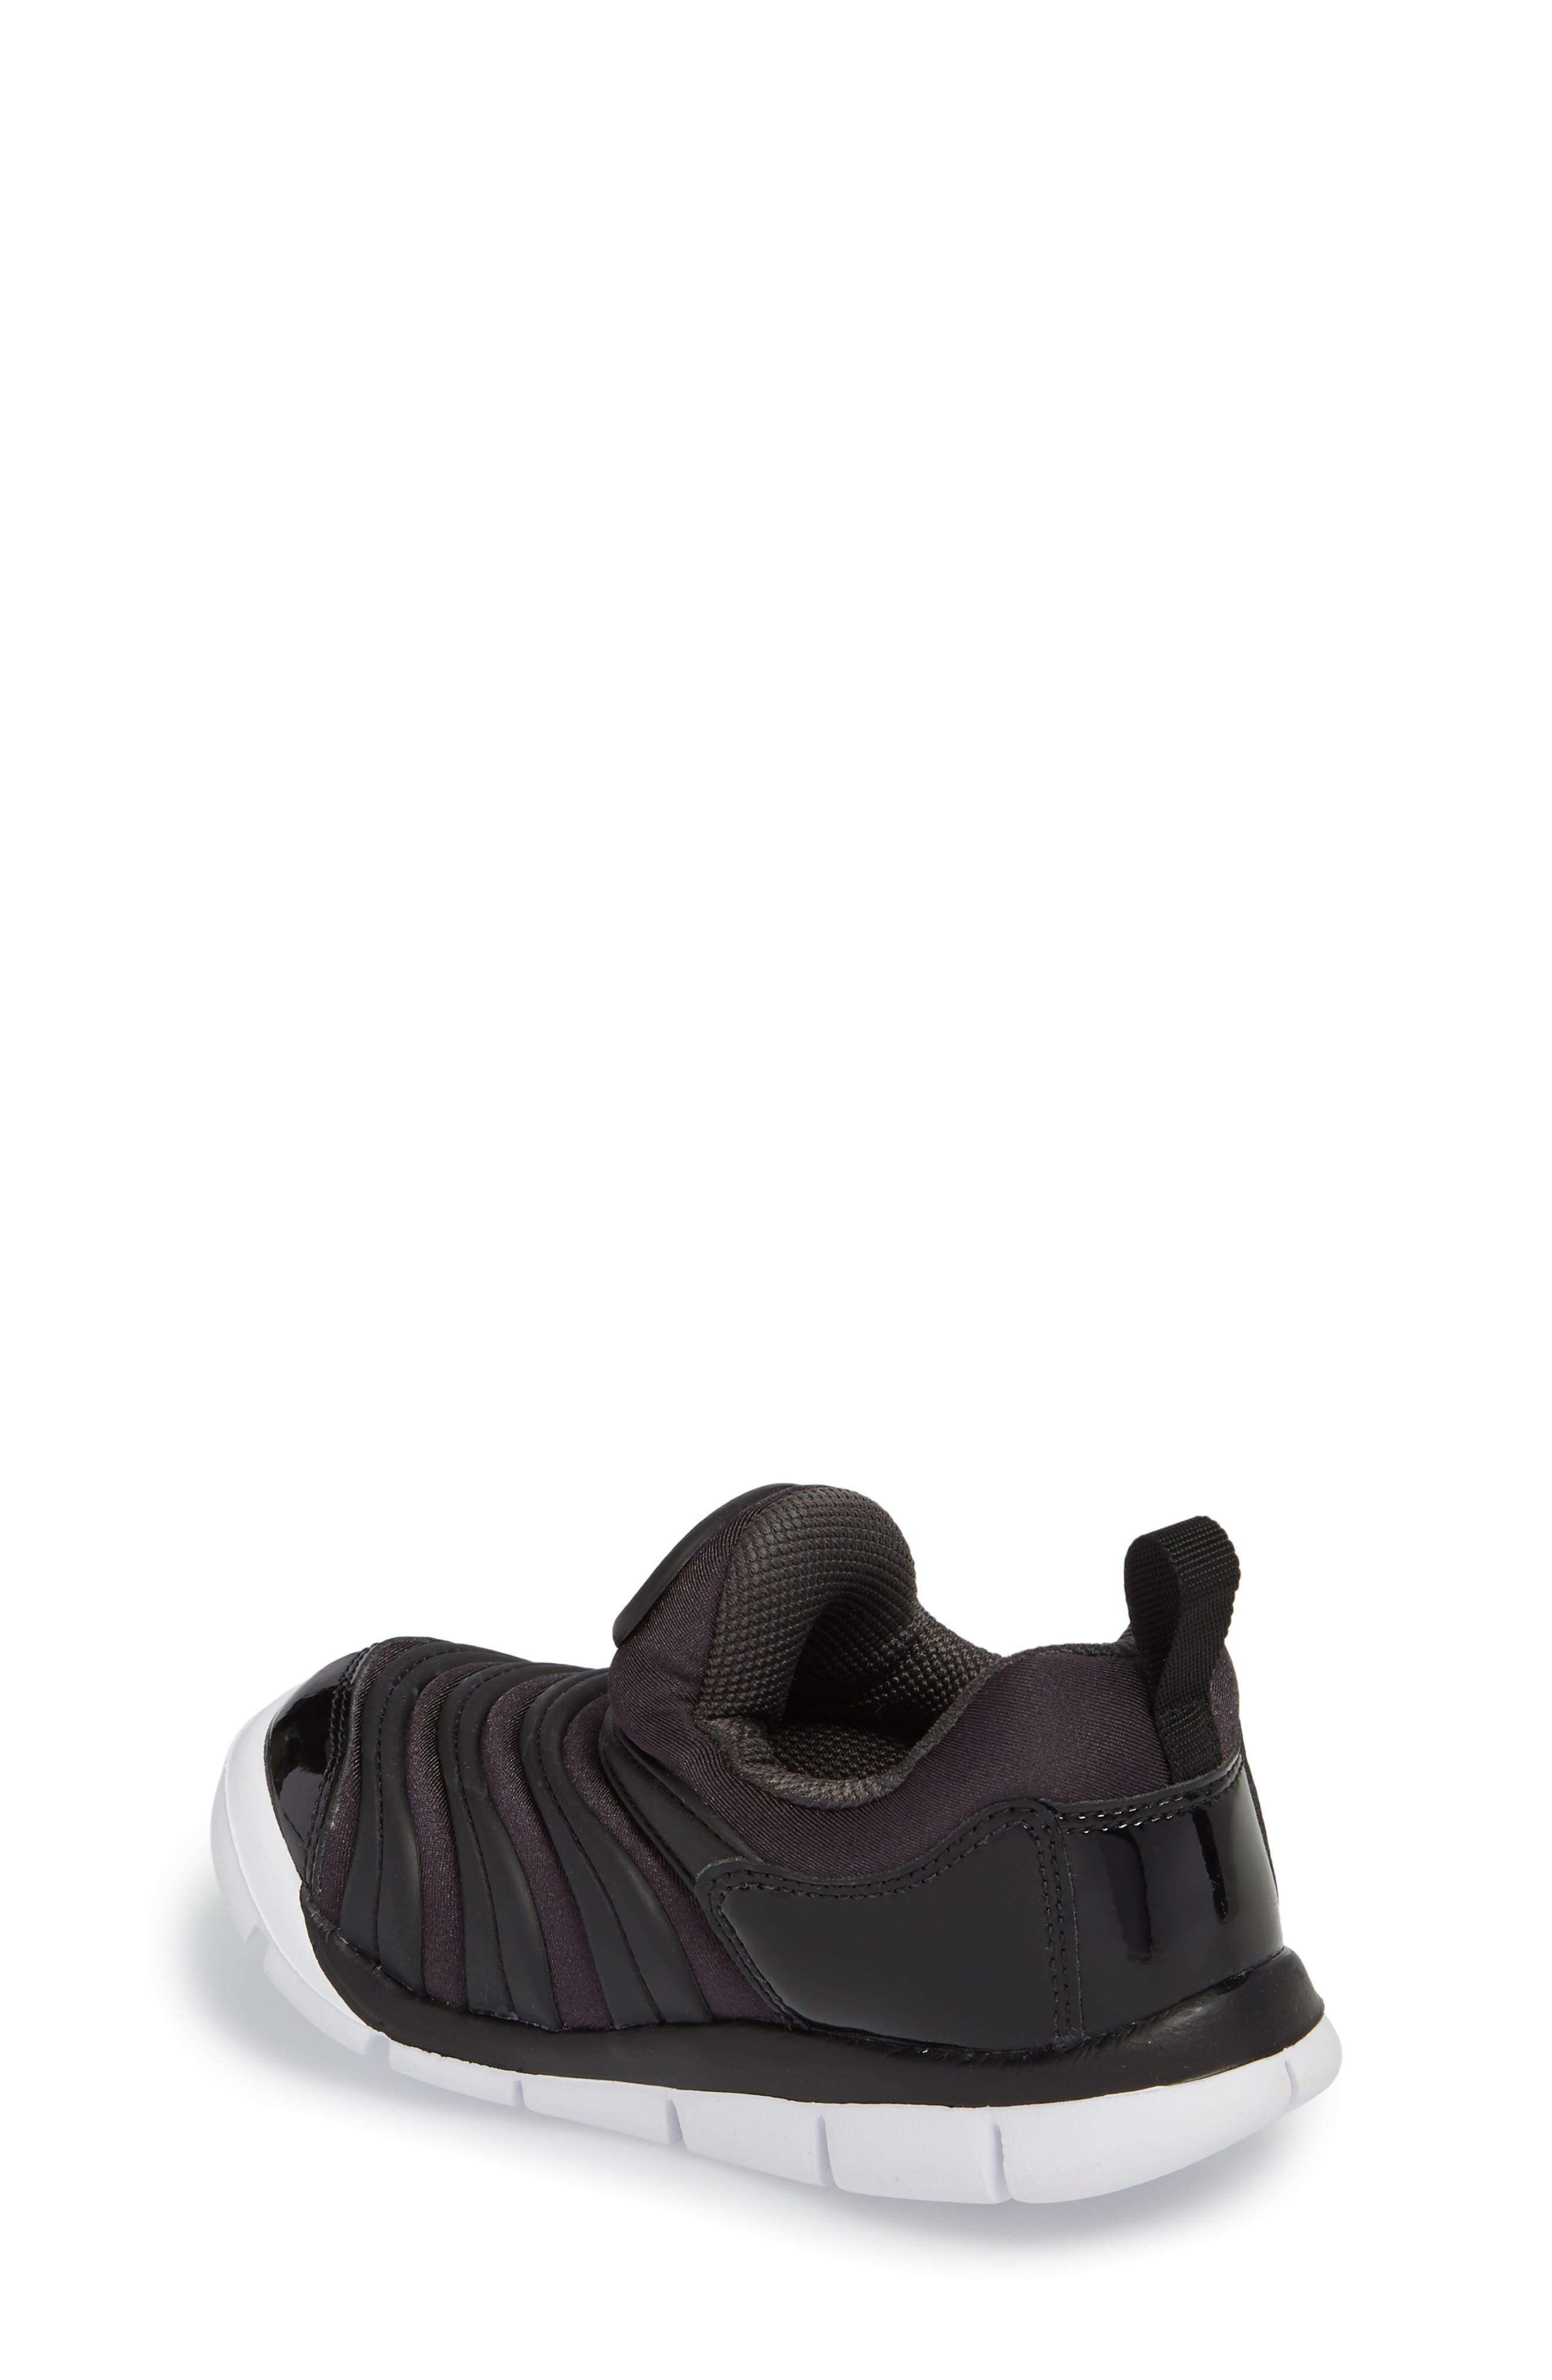 Dynamo Free Sneaker,                             Alternate thumbnail 2, color,                             ANTHRACITE/ WHITE/ BLACK